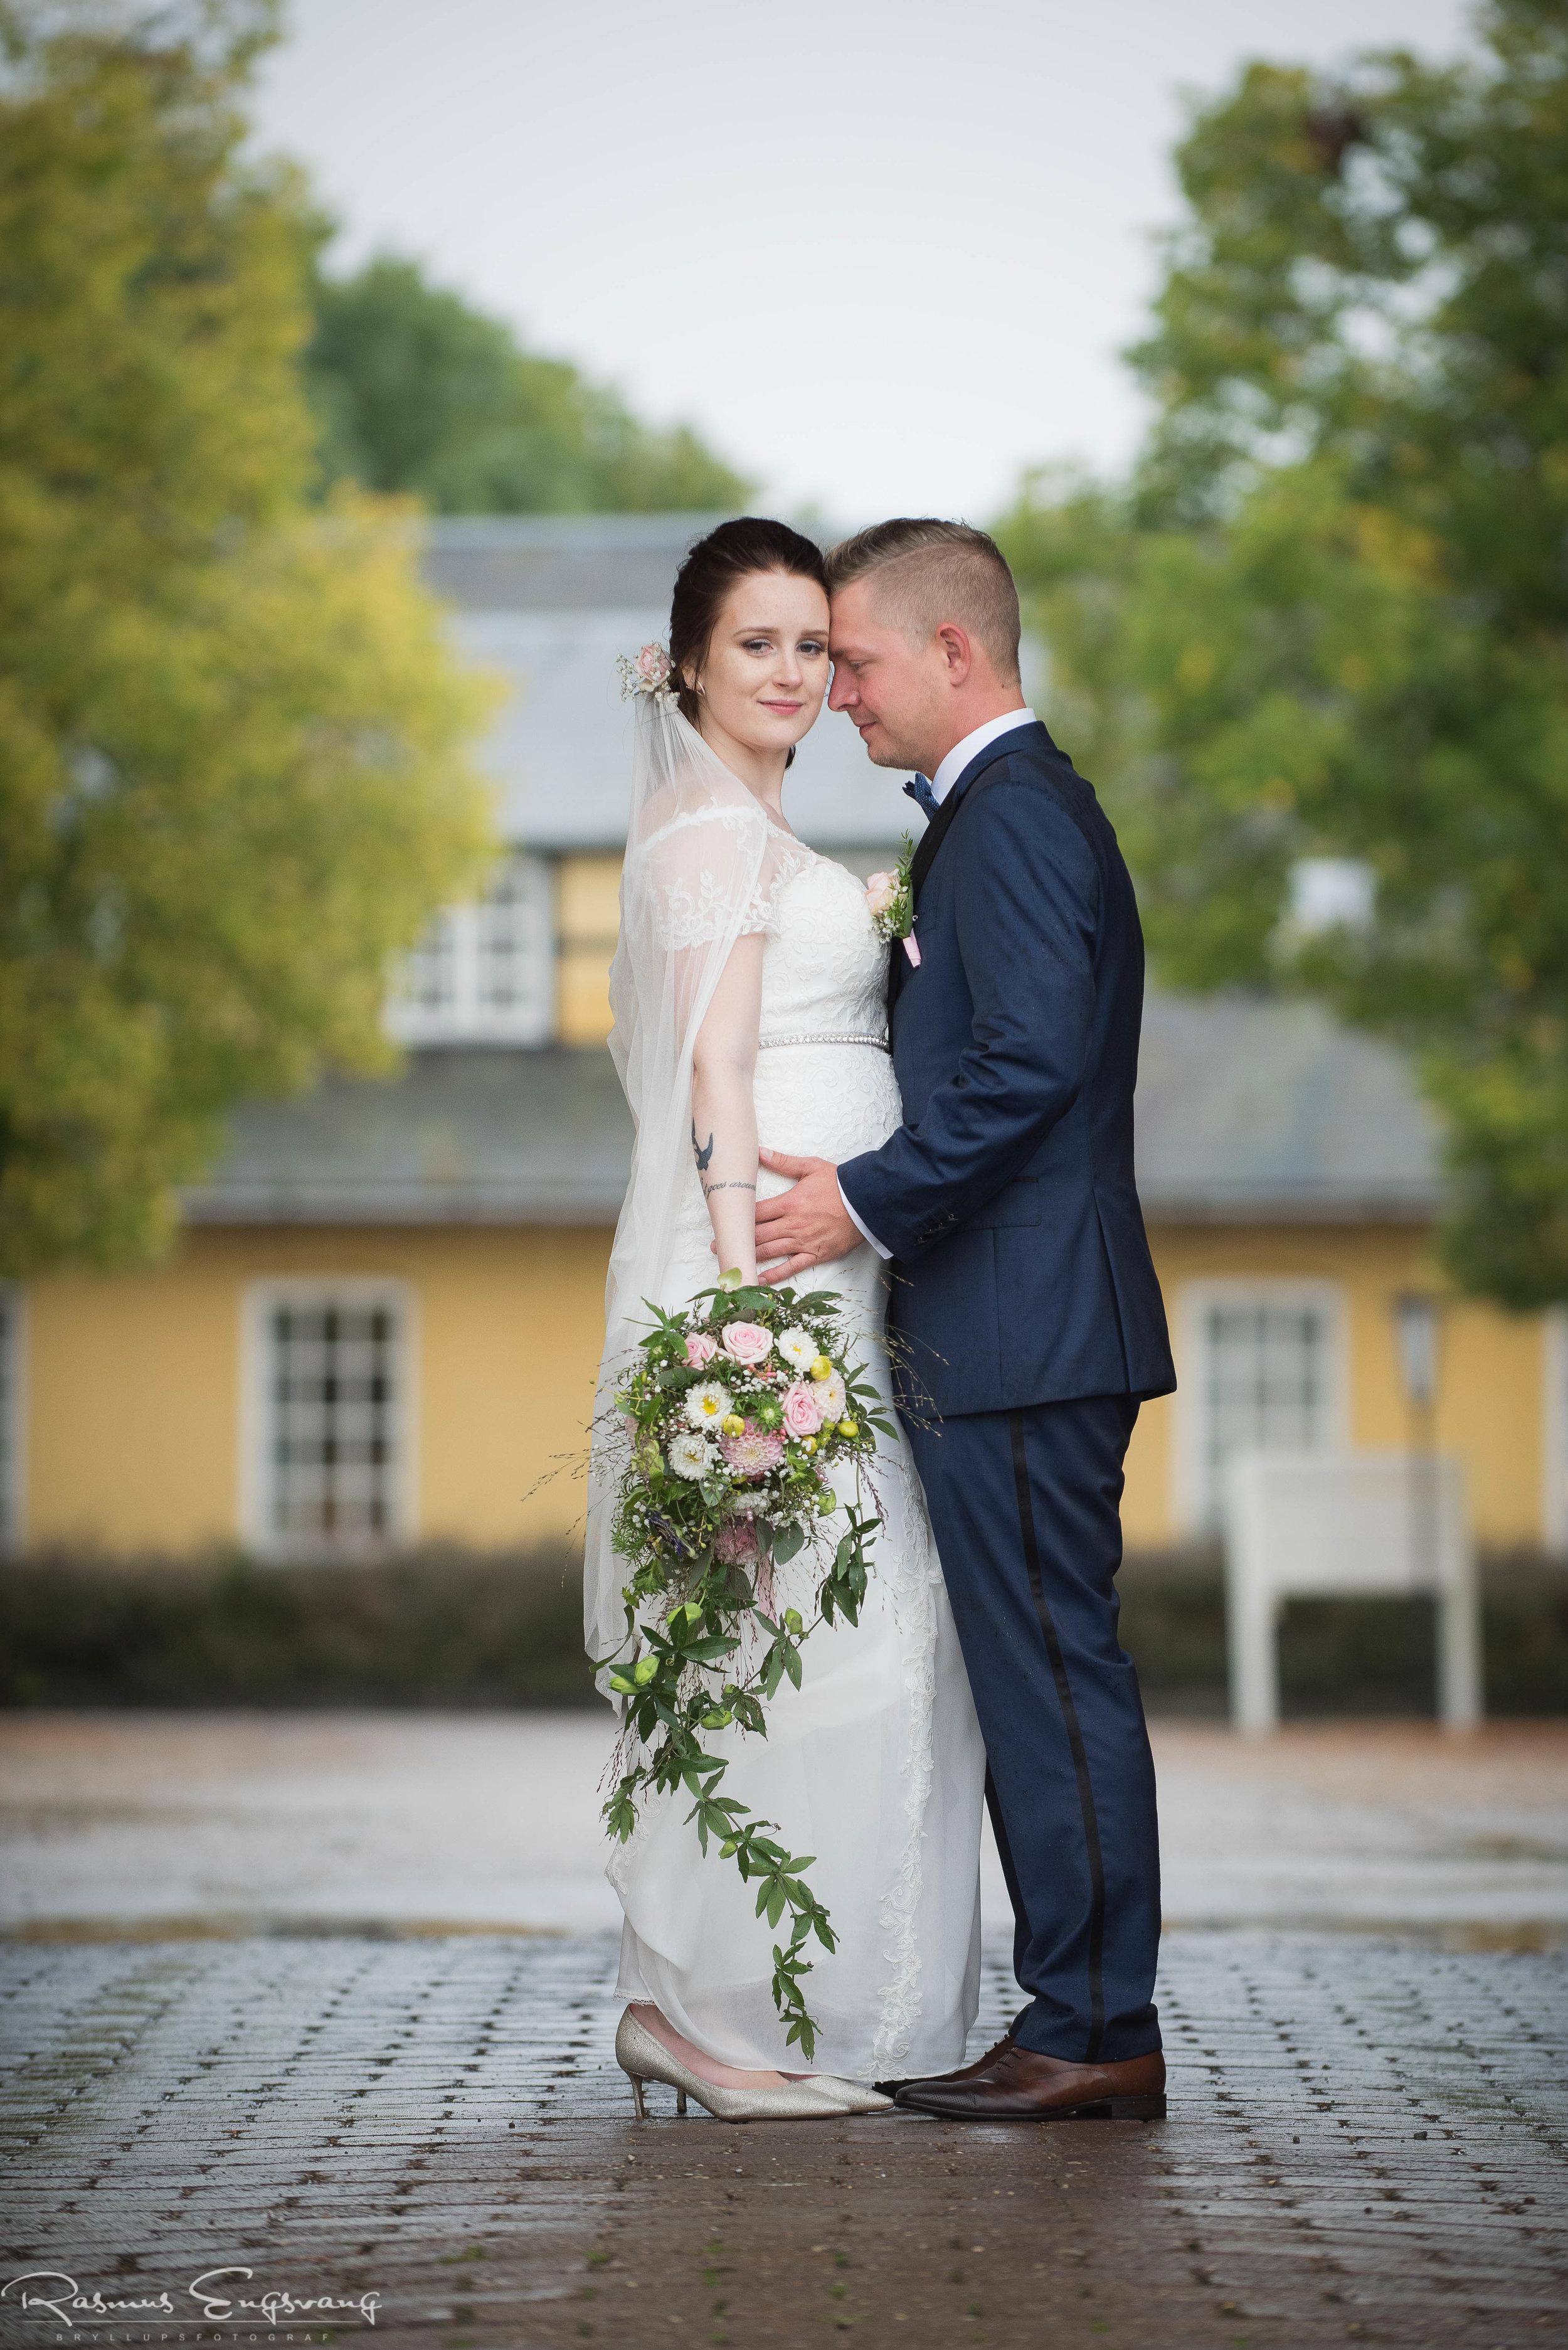 Bryllupsfotograf_Ringsted_Sjælland_Sørup_Herregaard-217.jpg